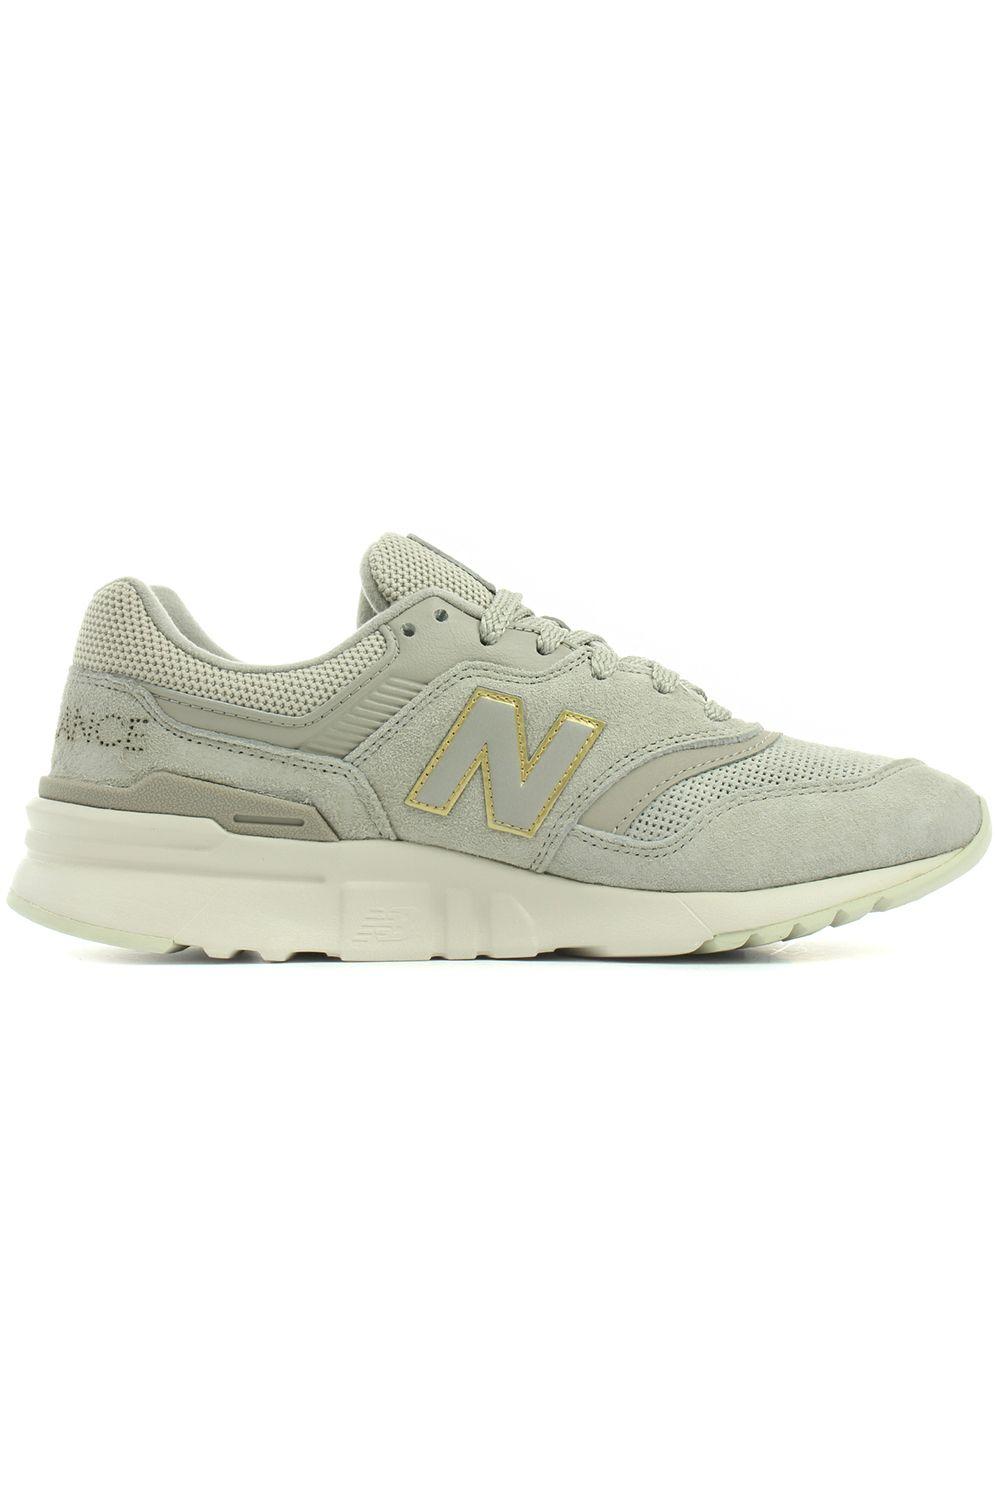 New Balance Shoes CW997 Grey